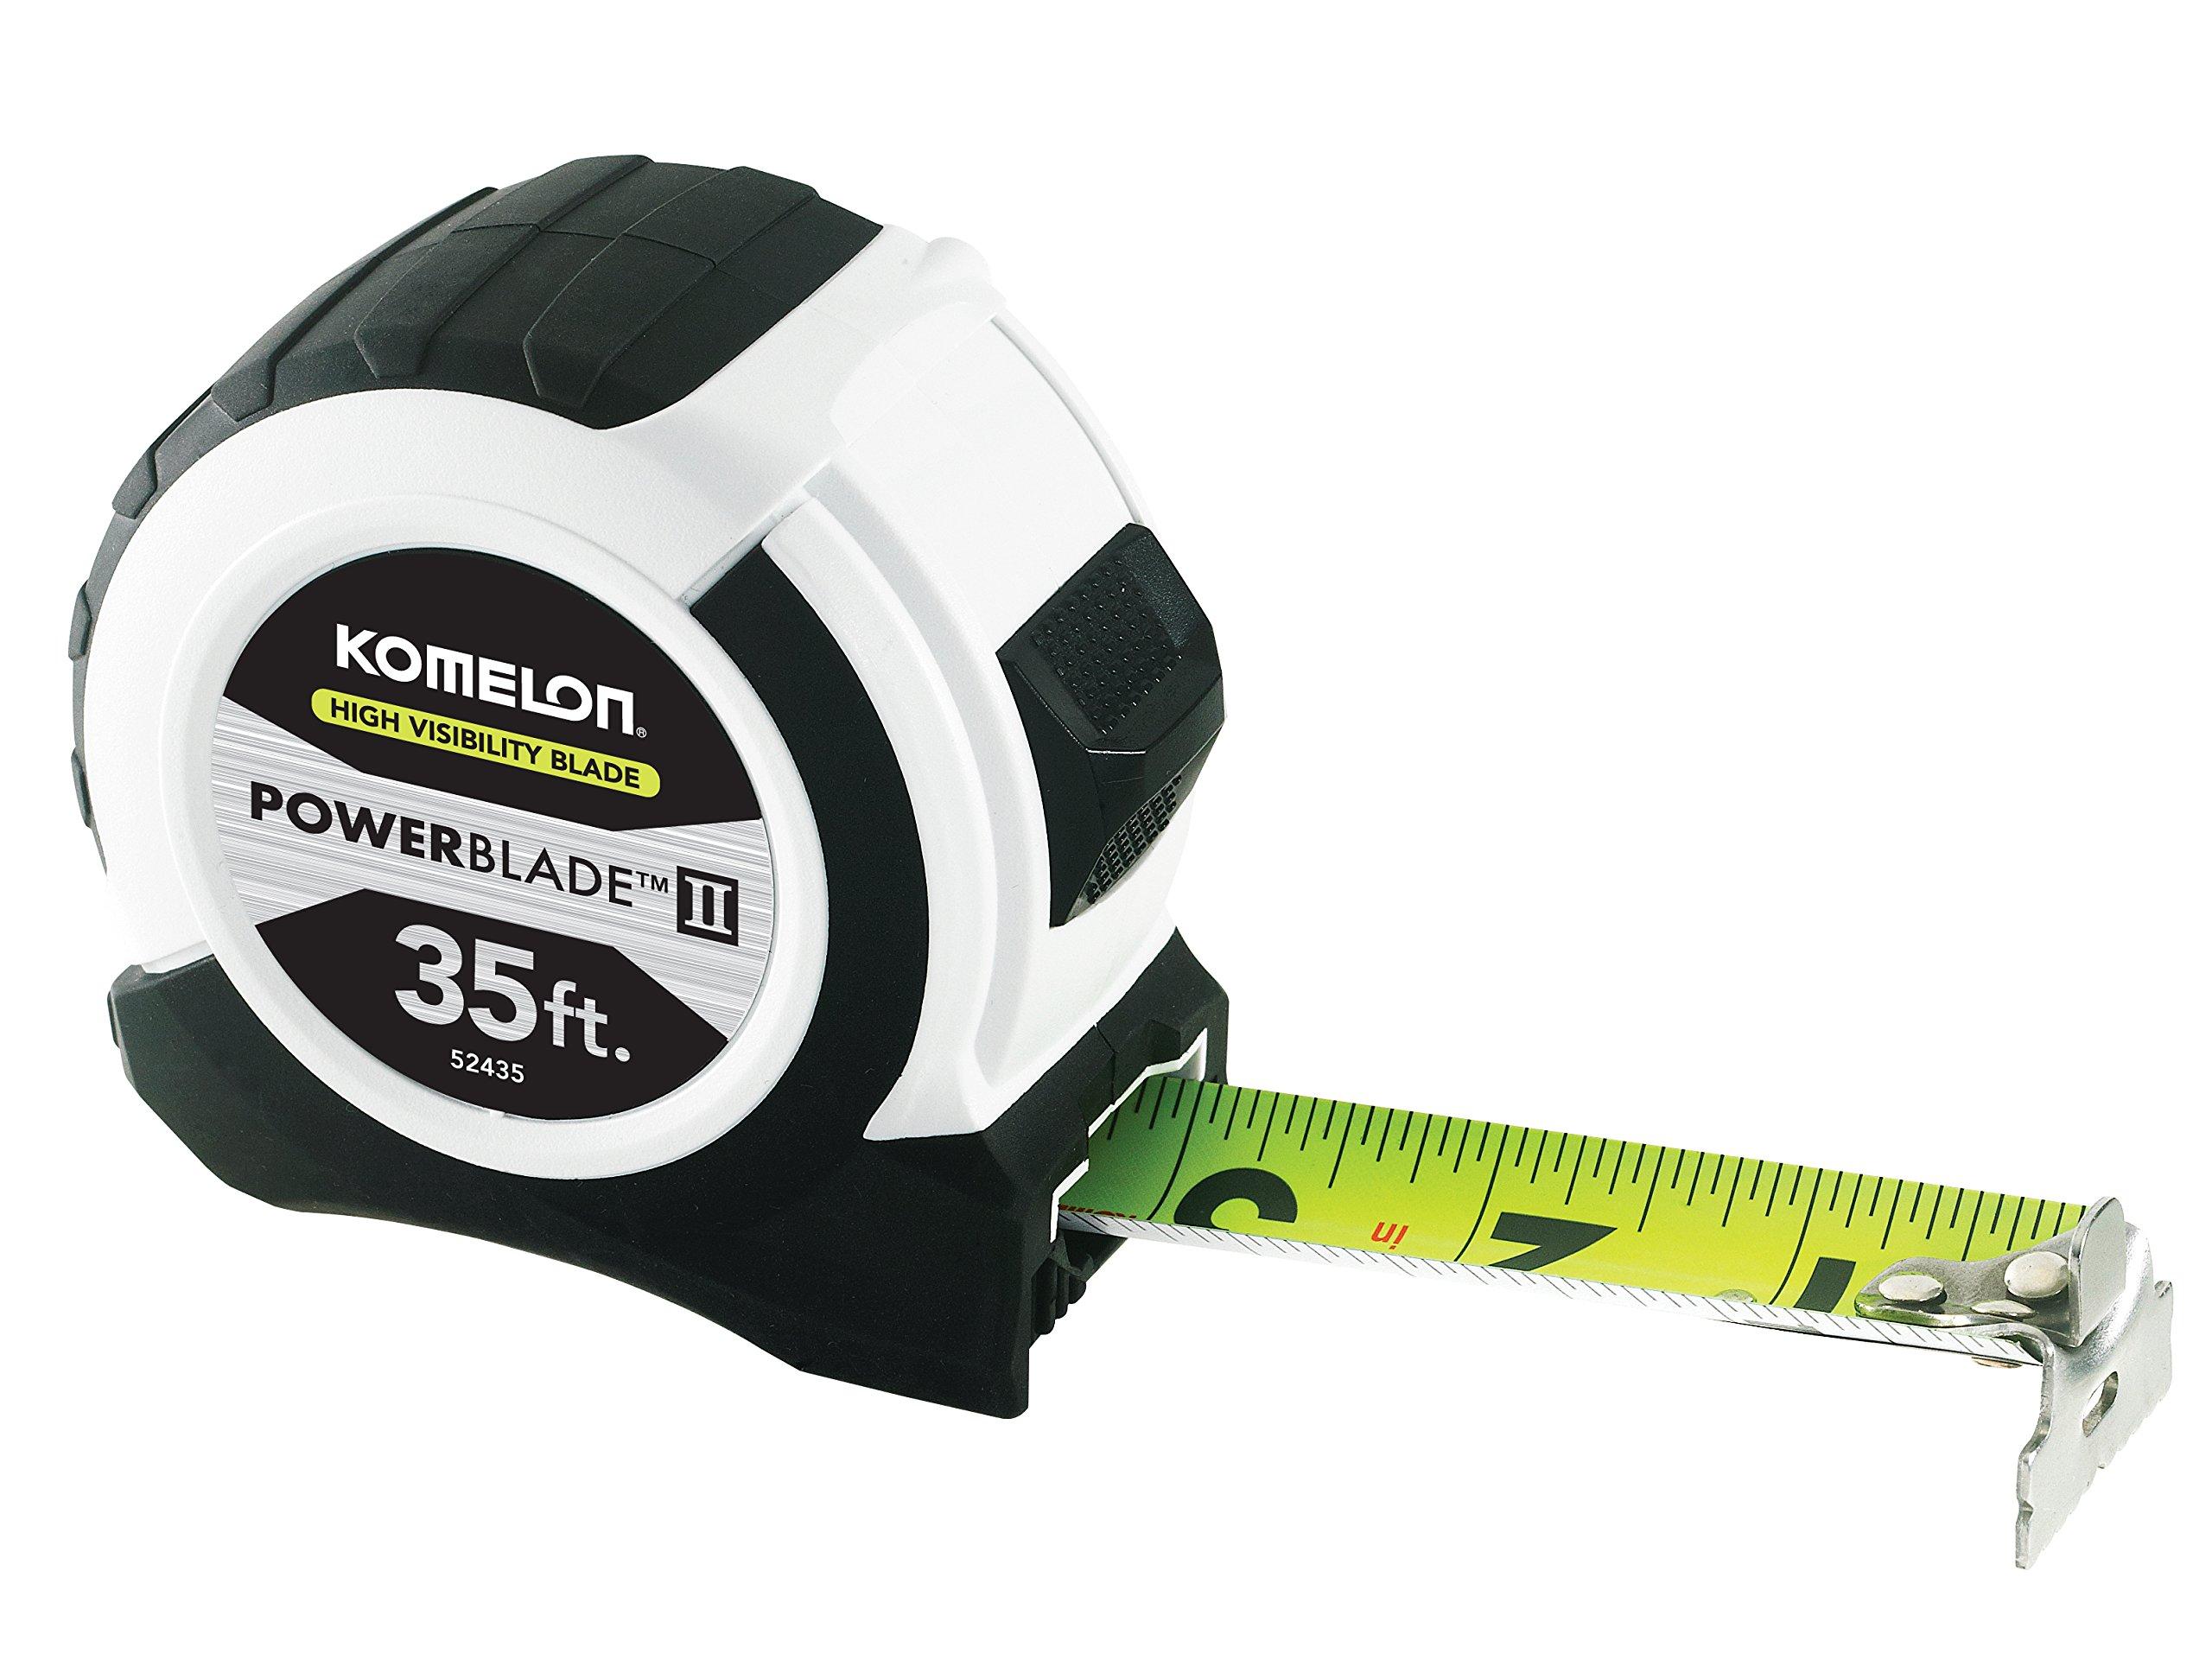 Komelon 52435; 35' x 1.06'' Powerblade II Tape Measure, ABS Case, Black/White by Komelon